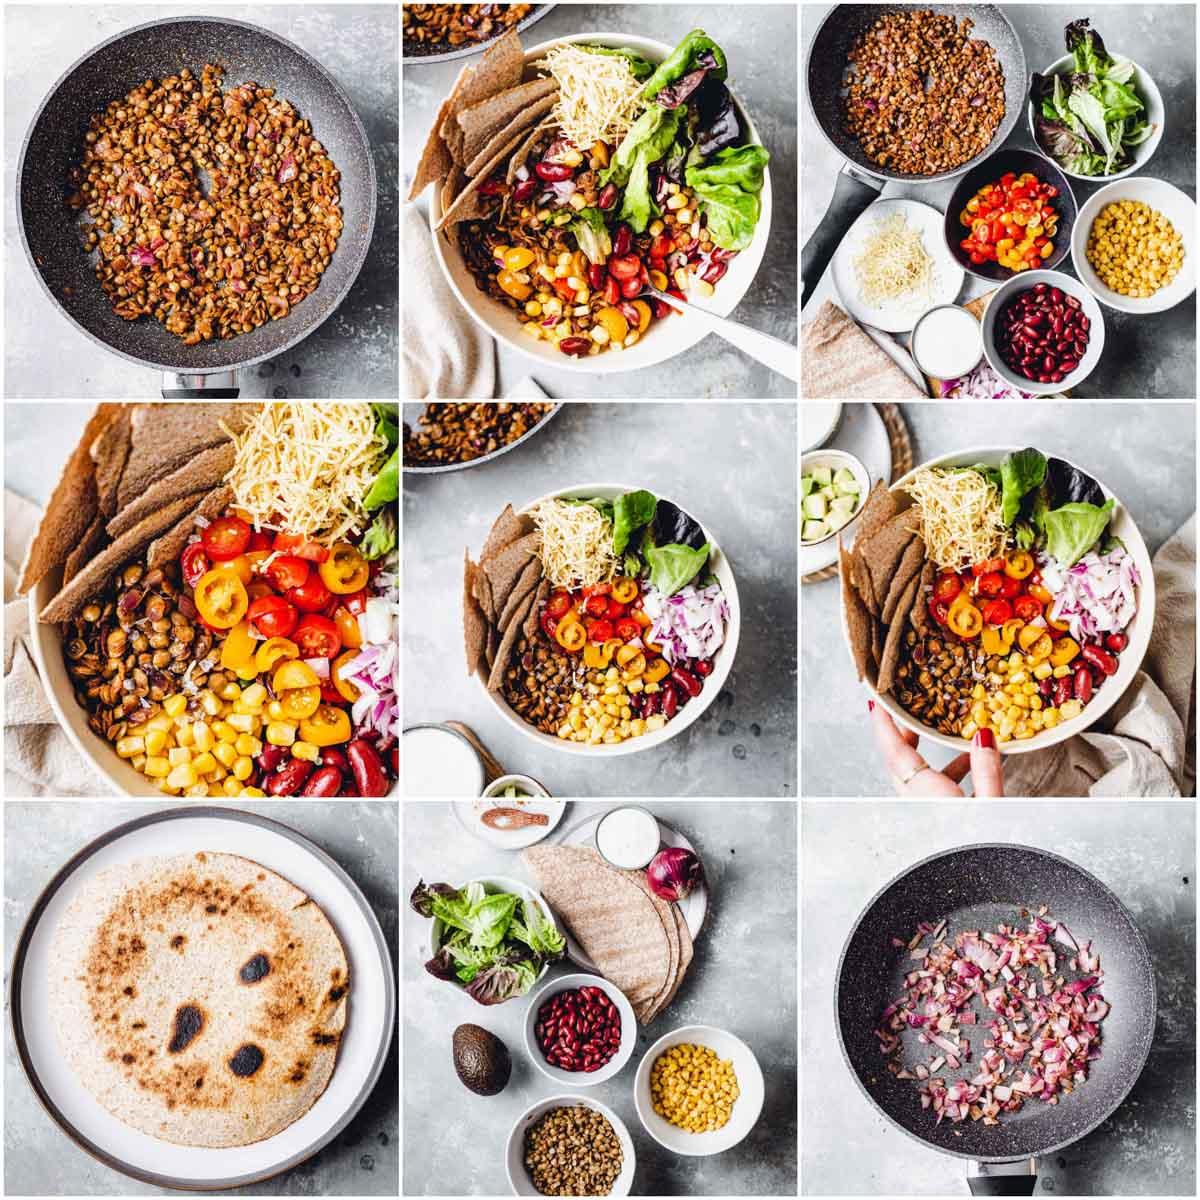 A collage of nine images showing vegan taco salad.